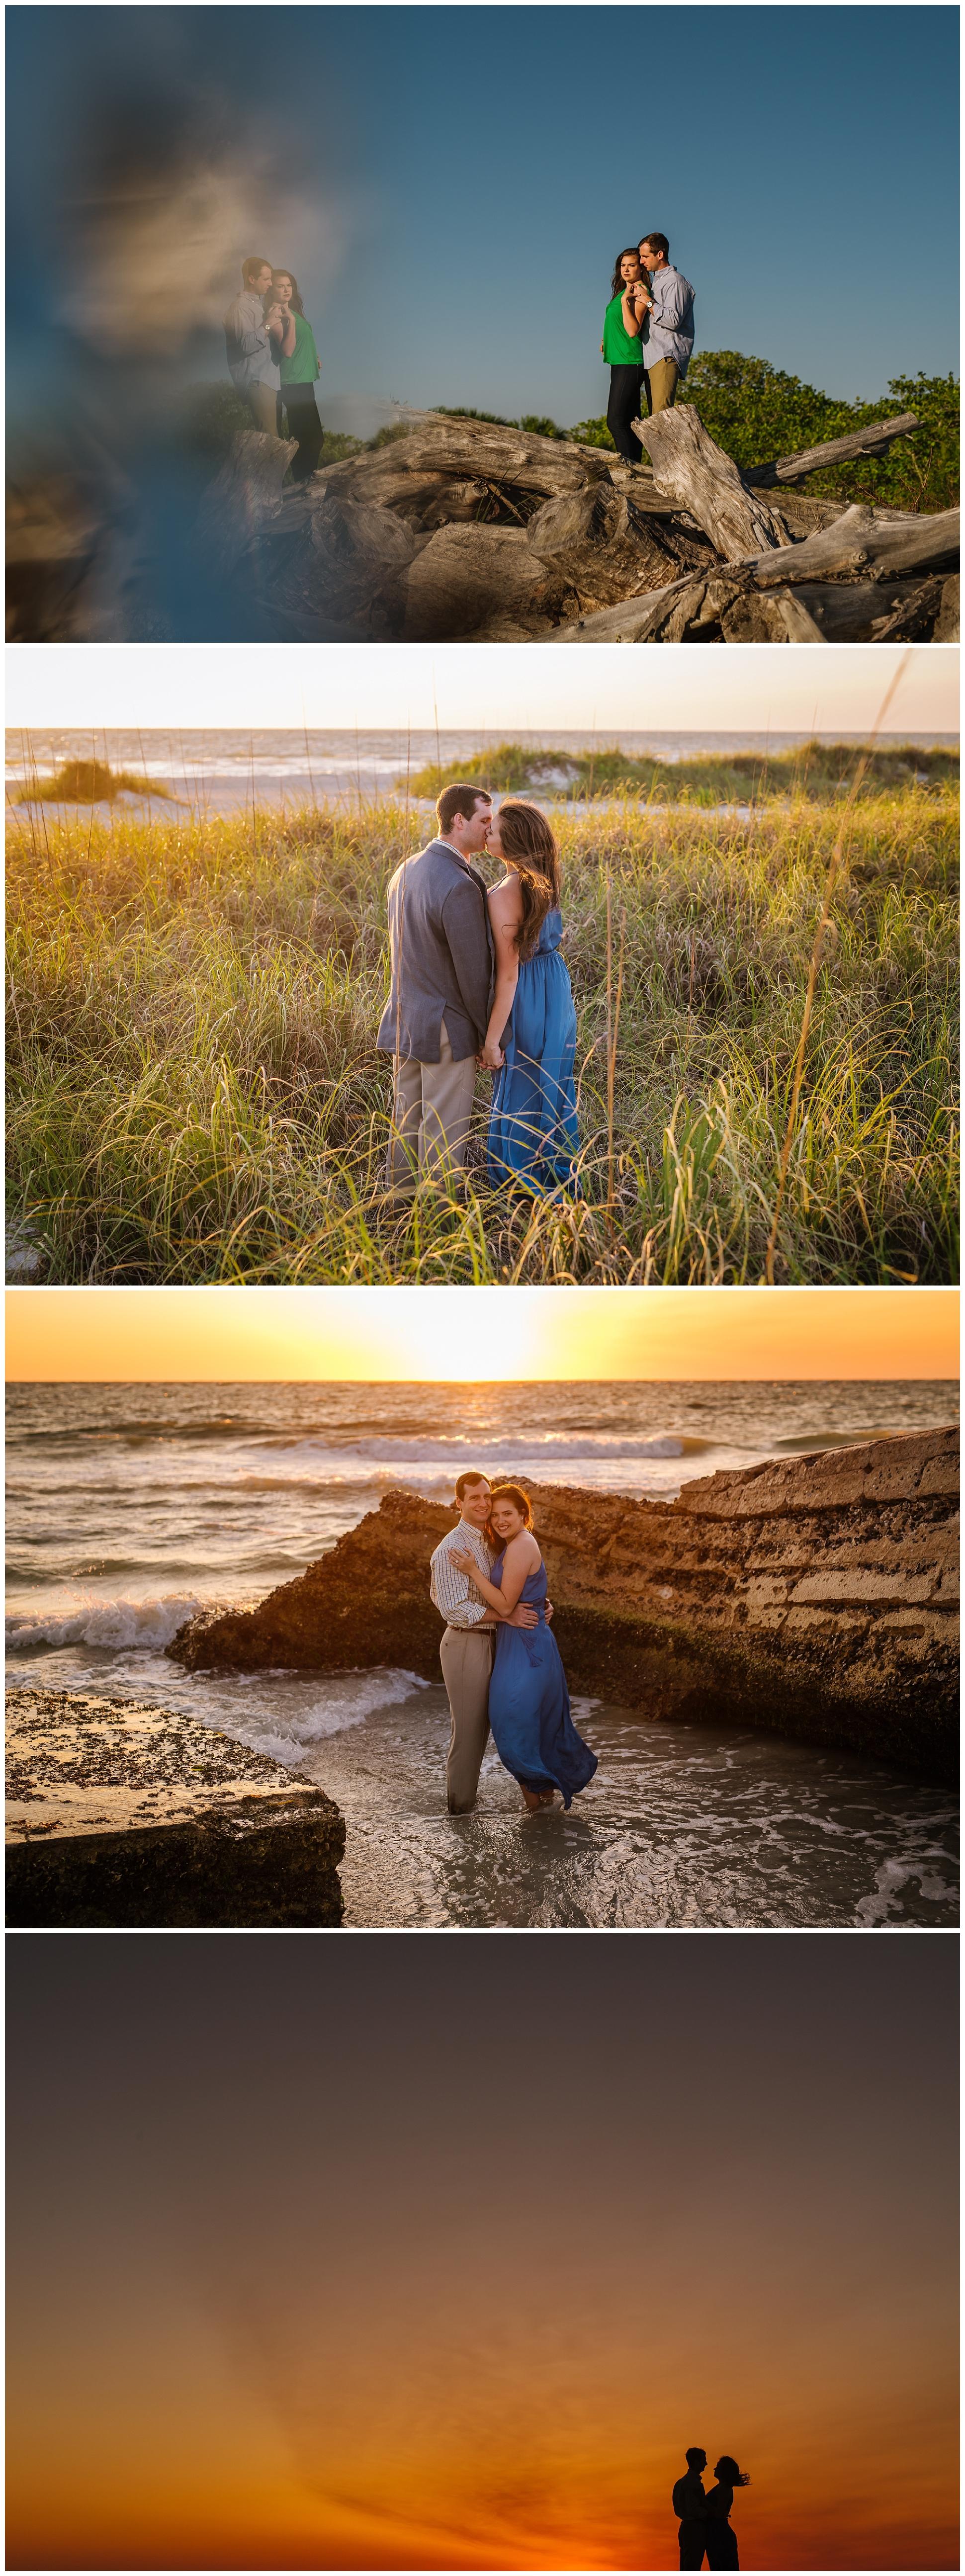 Ashlee-hamon-photography-year-in-review-2016-travel-wanderlust-vsco-adventure-wedding_0066.jpg